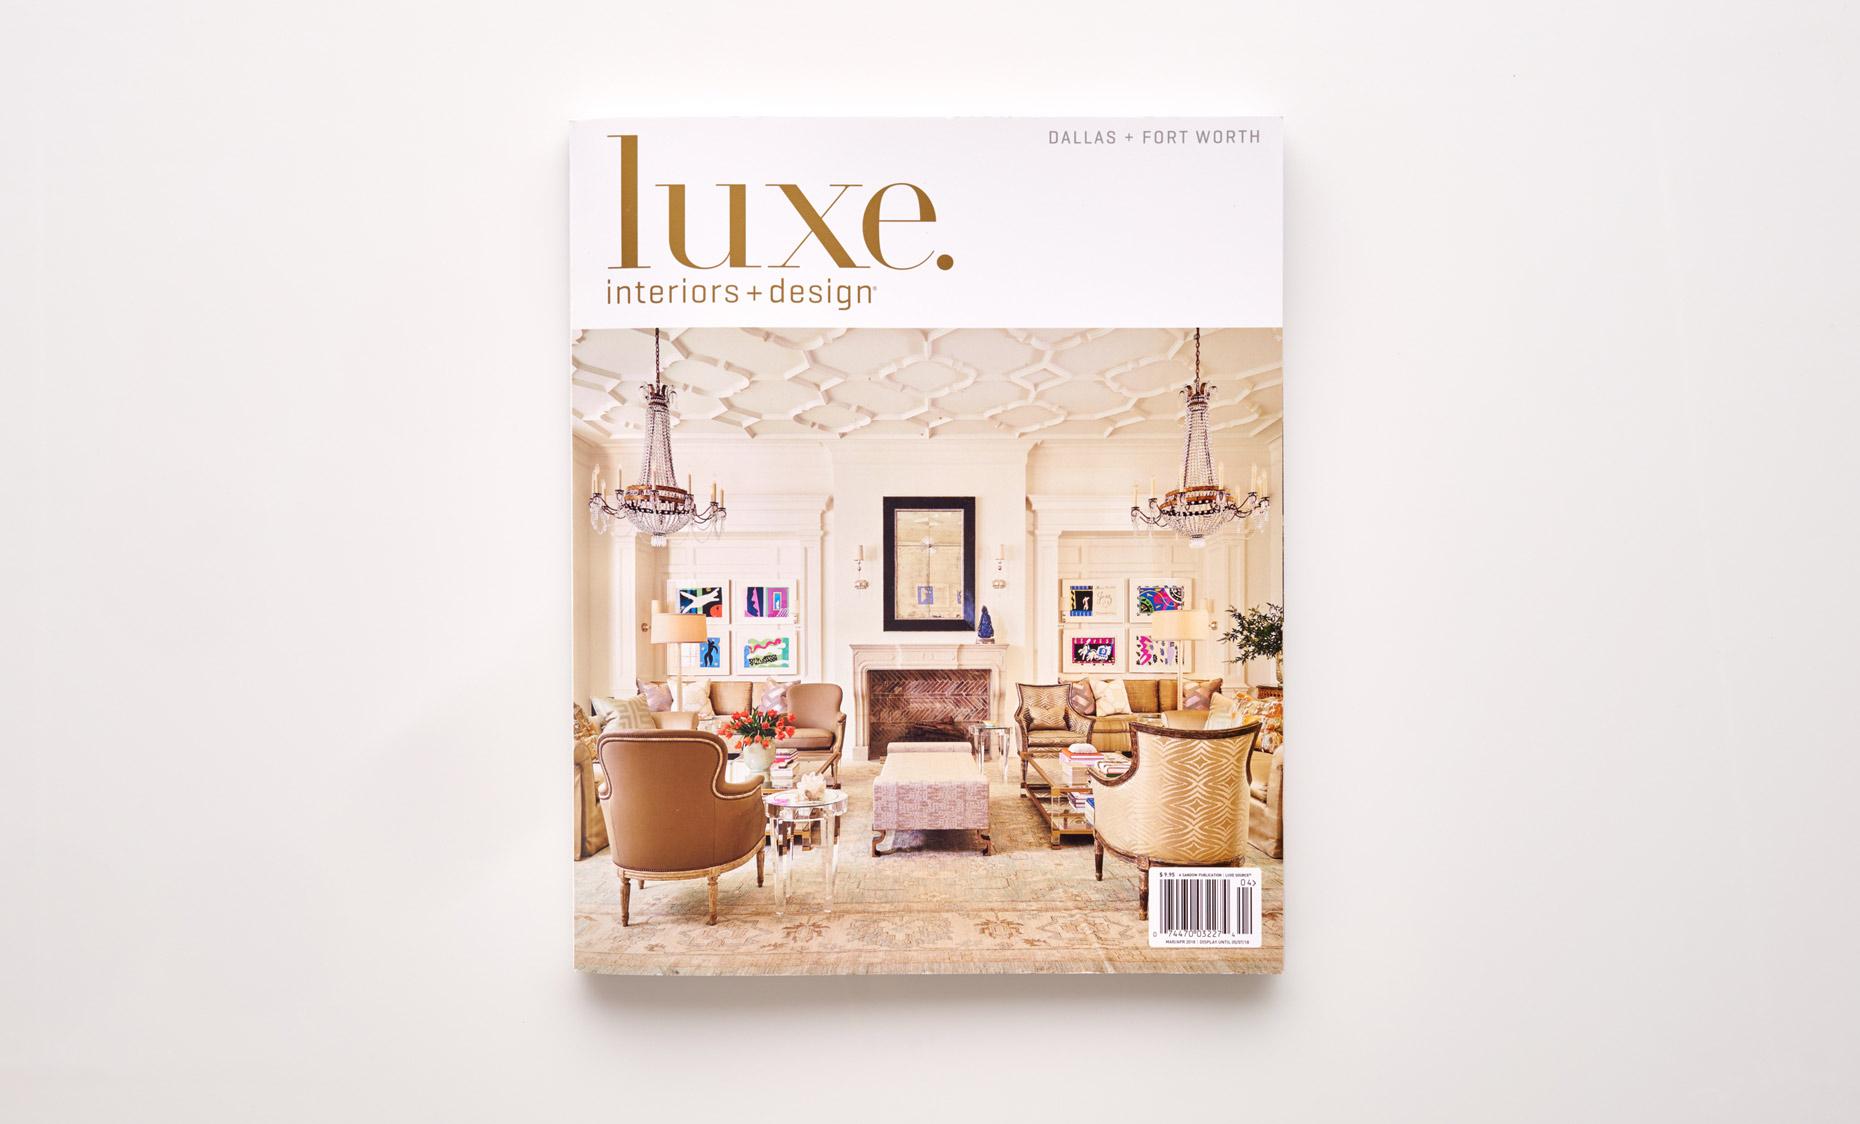 Stephen Karlisch Luxe Elegant Expanse Magazine Cover